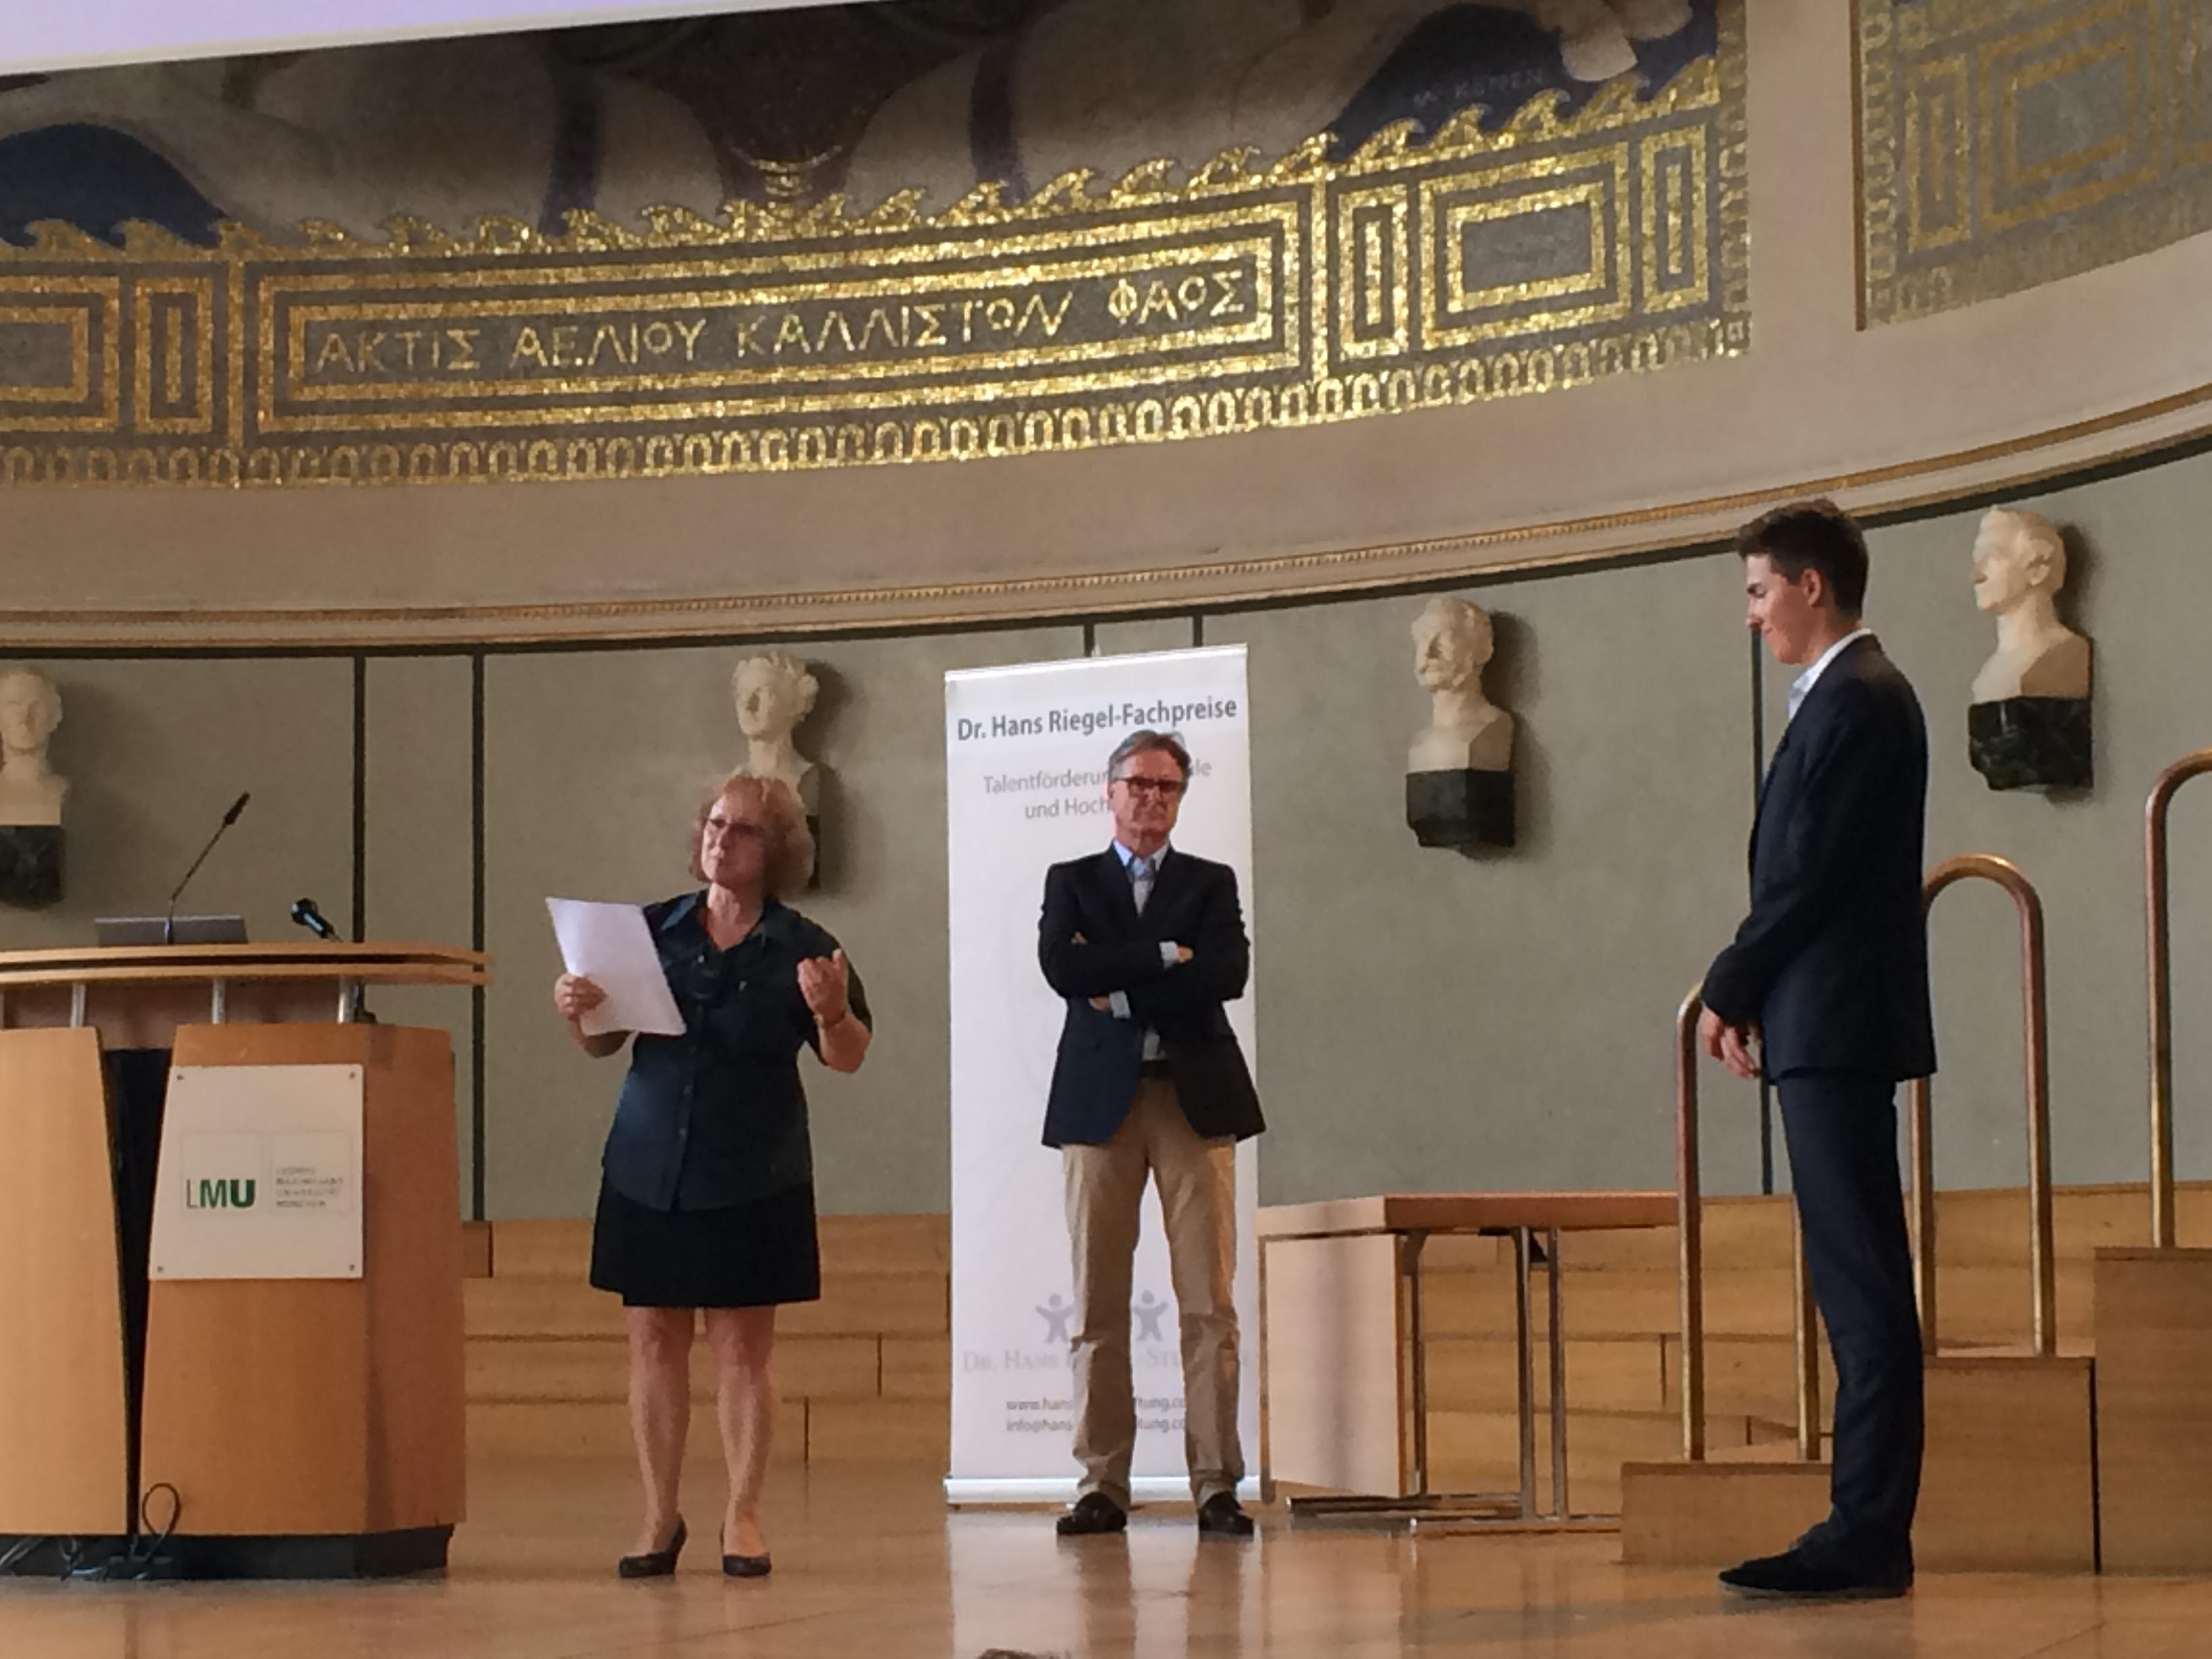 Dr. Hans Riegel-Fachpreis: Moritz Kleybolte